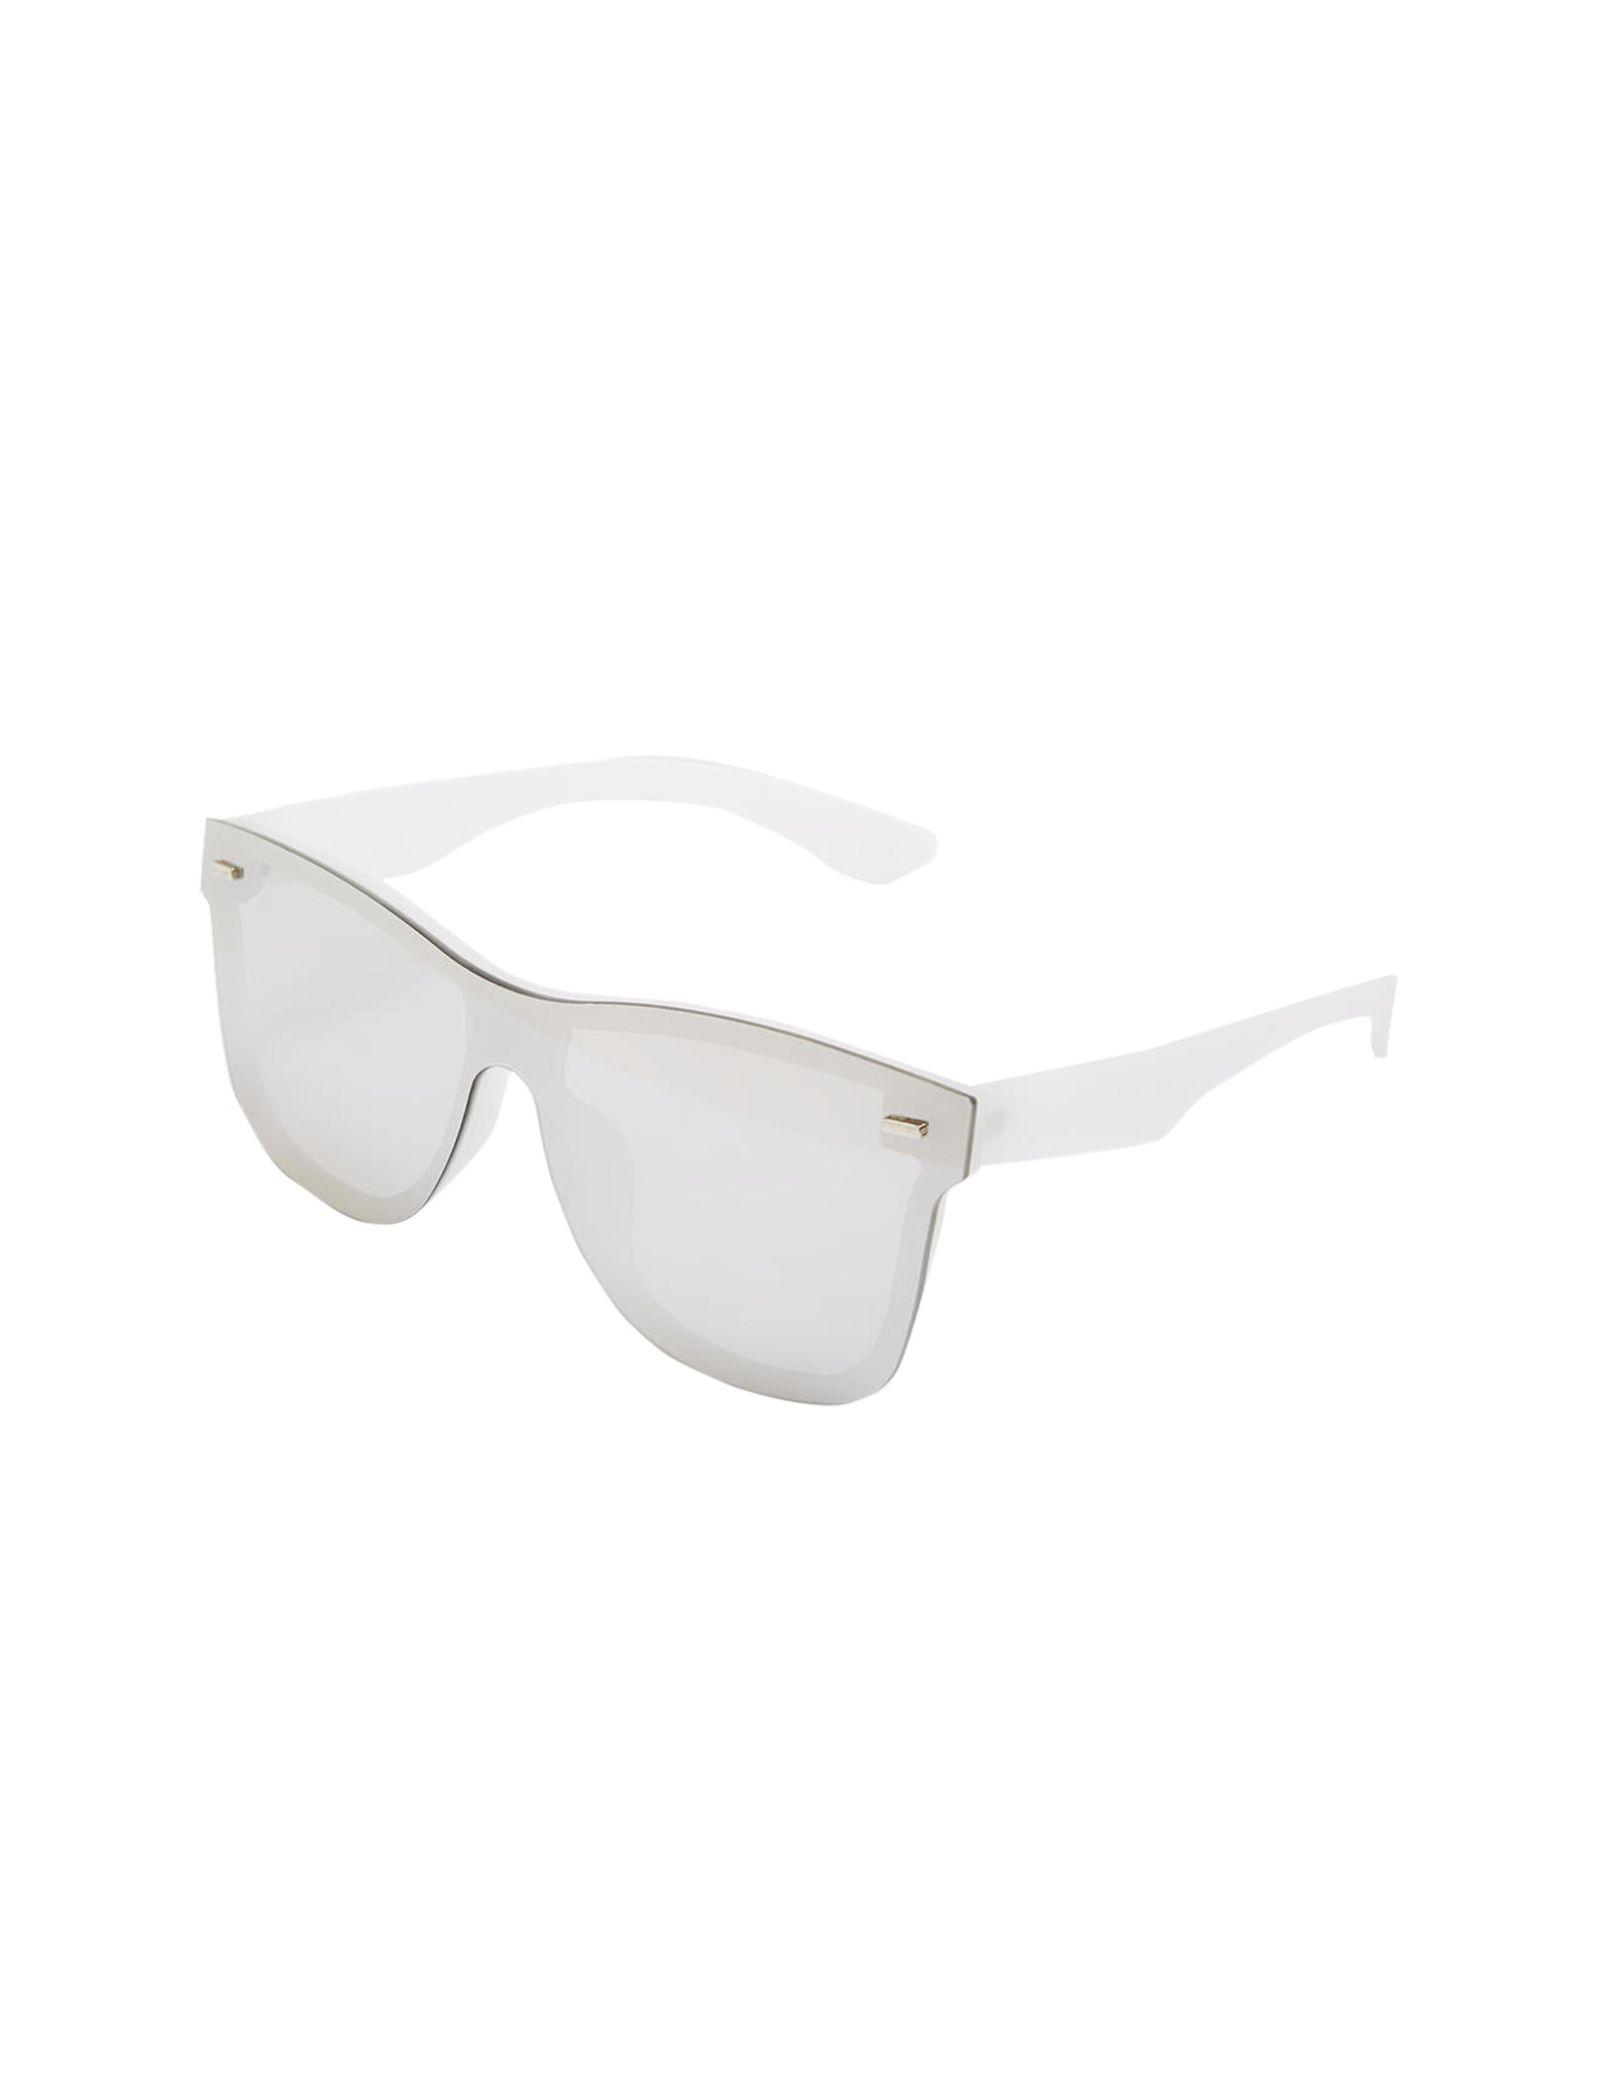 عینک آفتابی ویفرر مردانه - آلدو - سفيد - 1